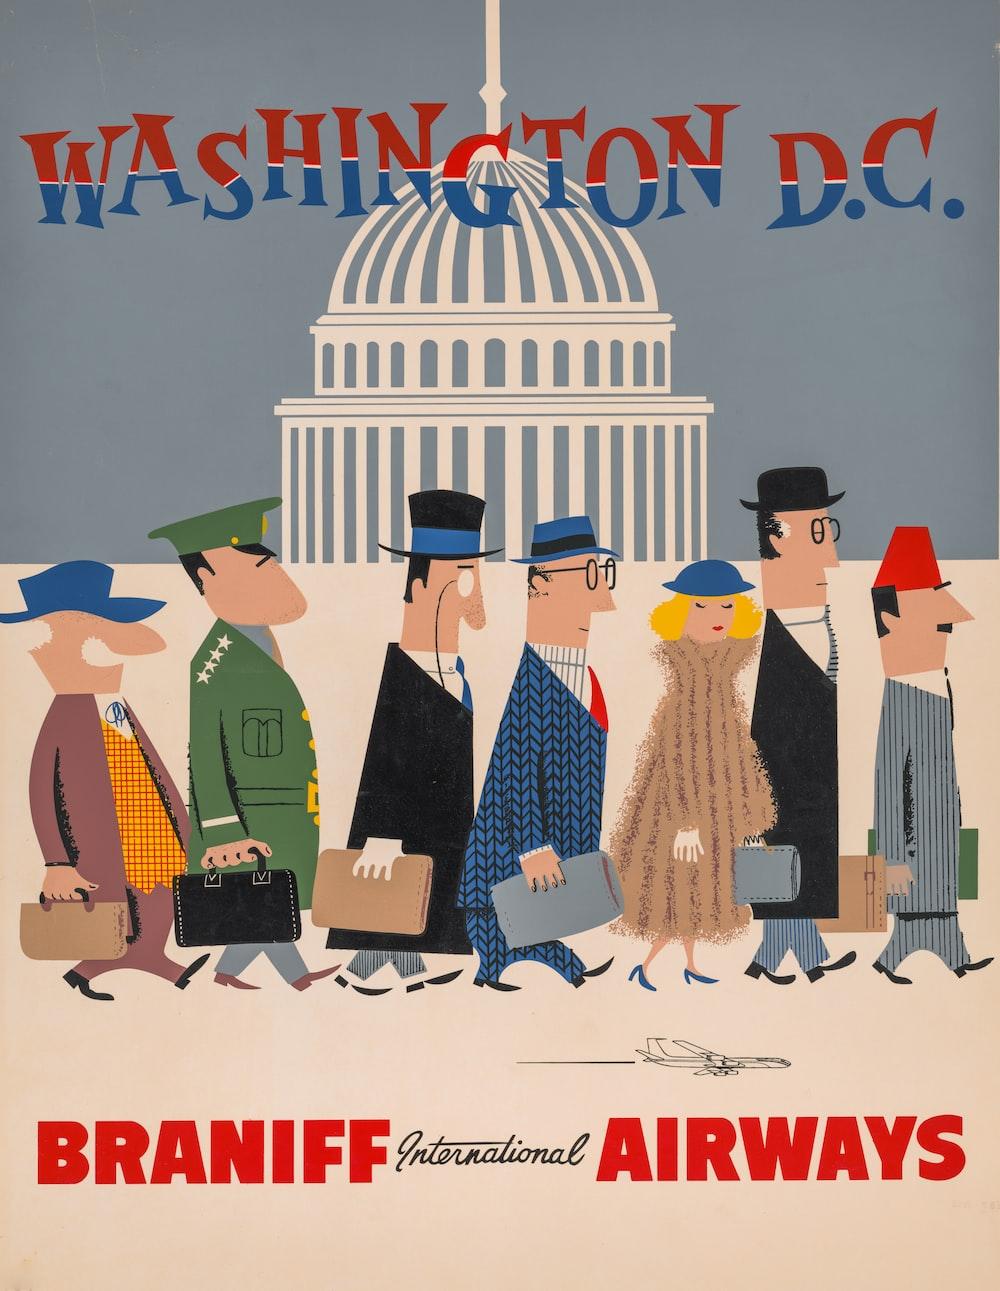 Washington, D.C. - Braniff International Airways